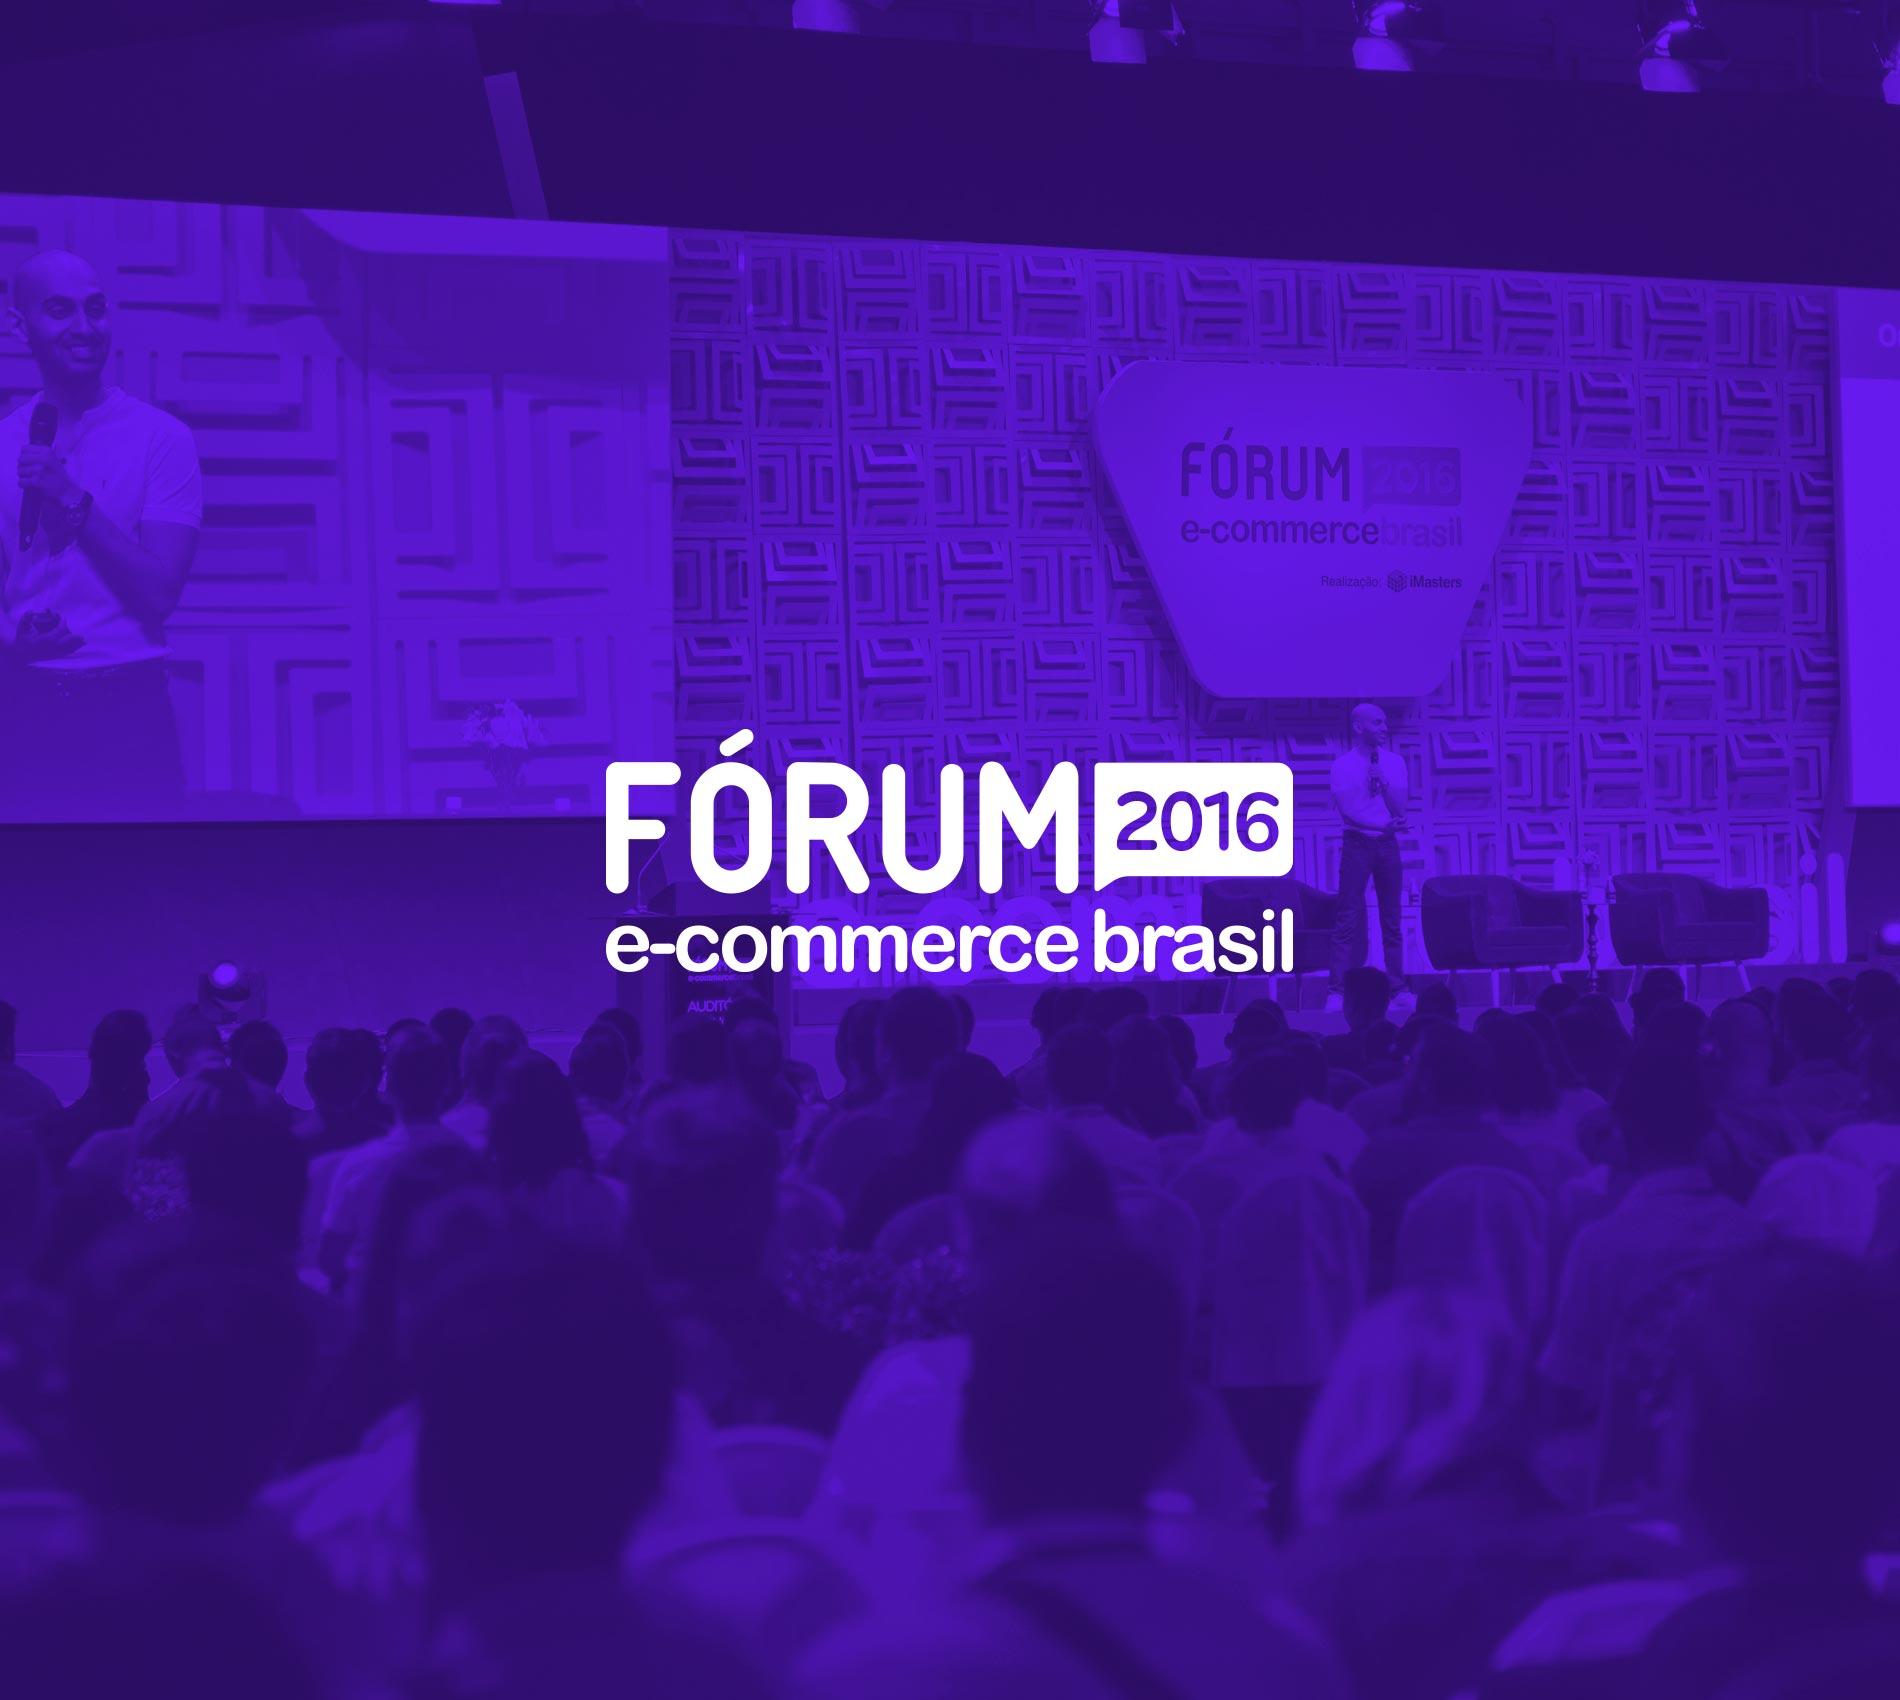 Fórum E-Commerce Brasil 2016, São Paulo